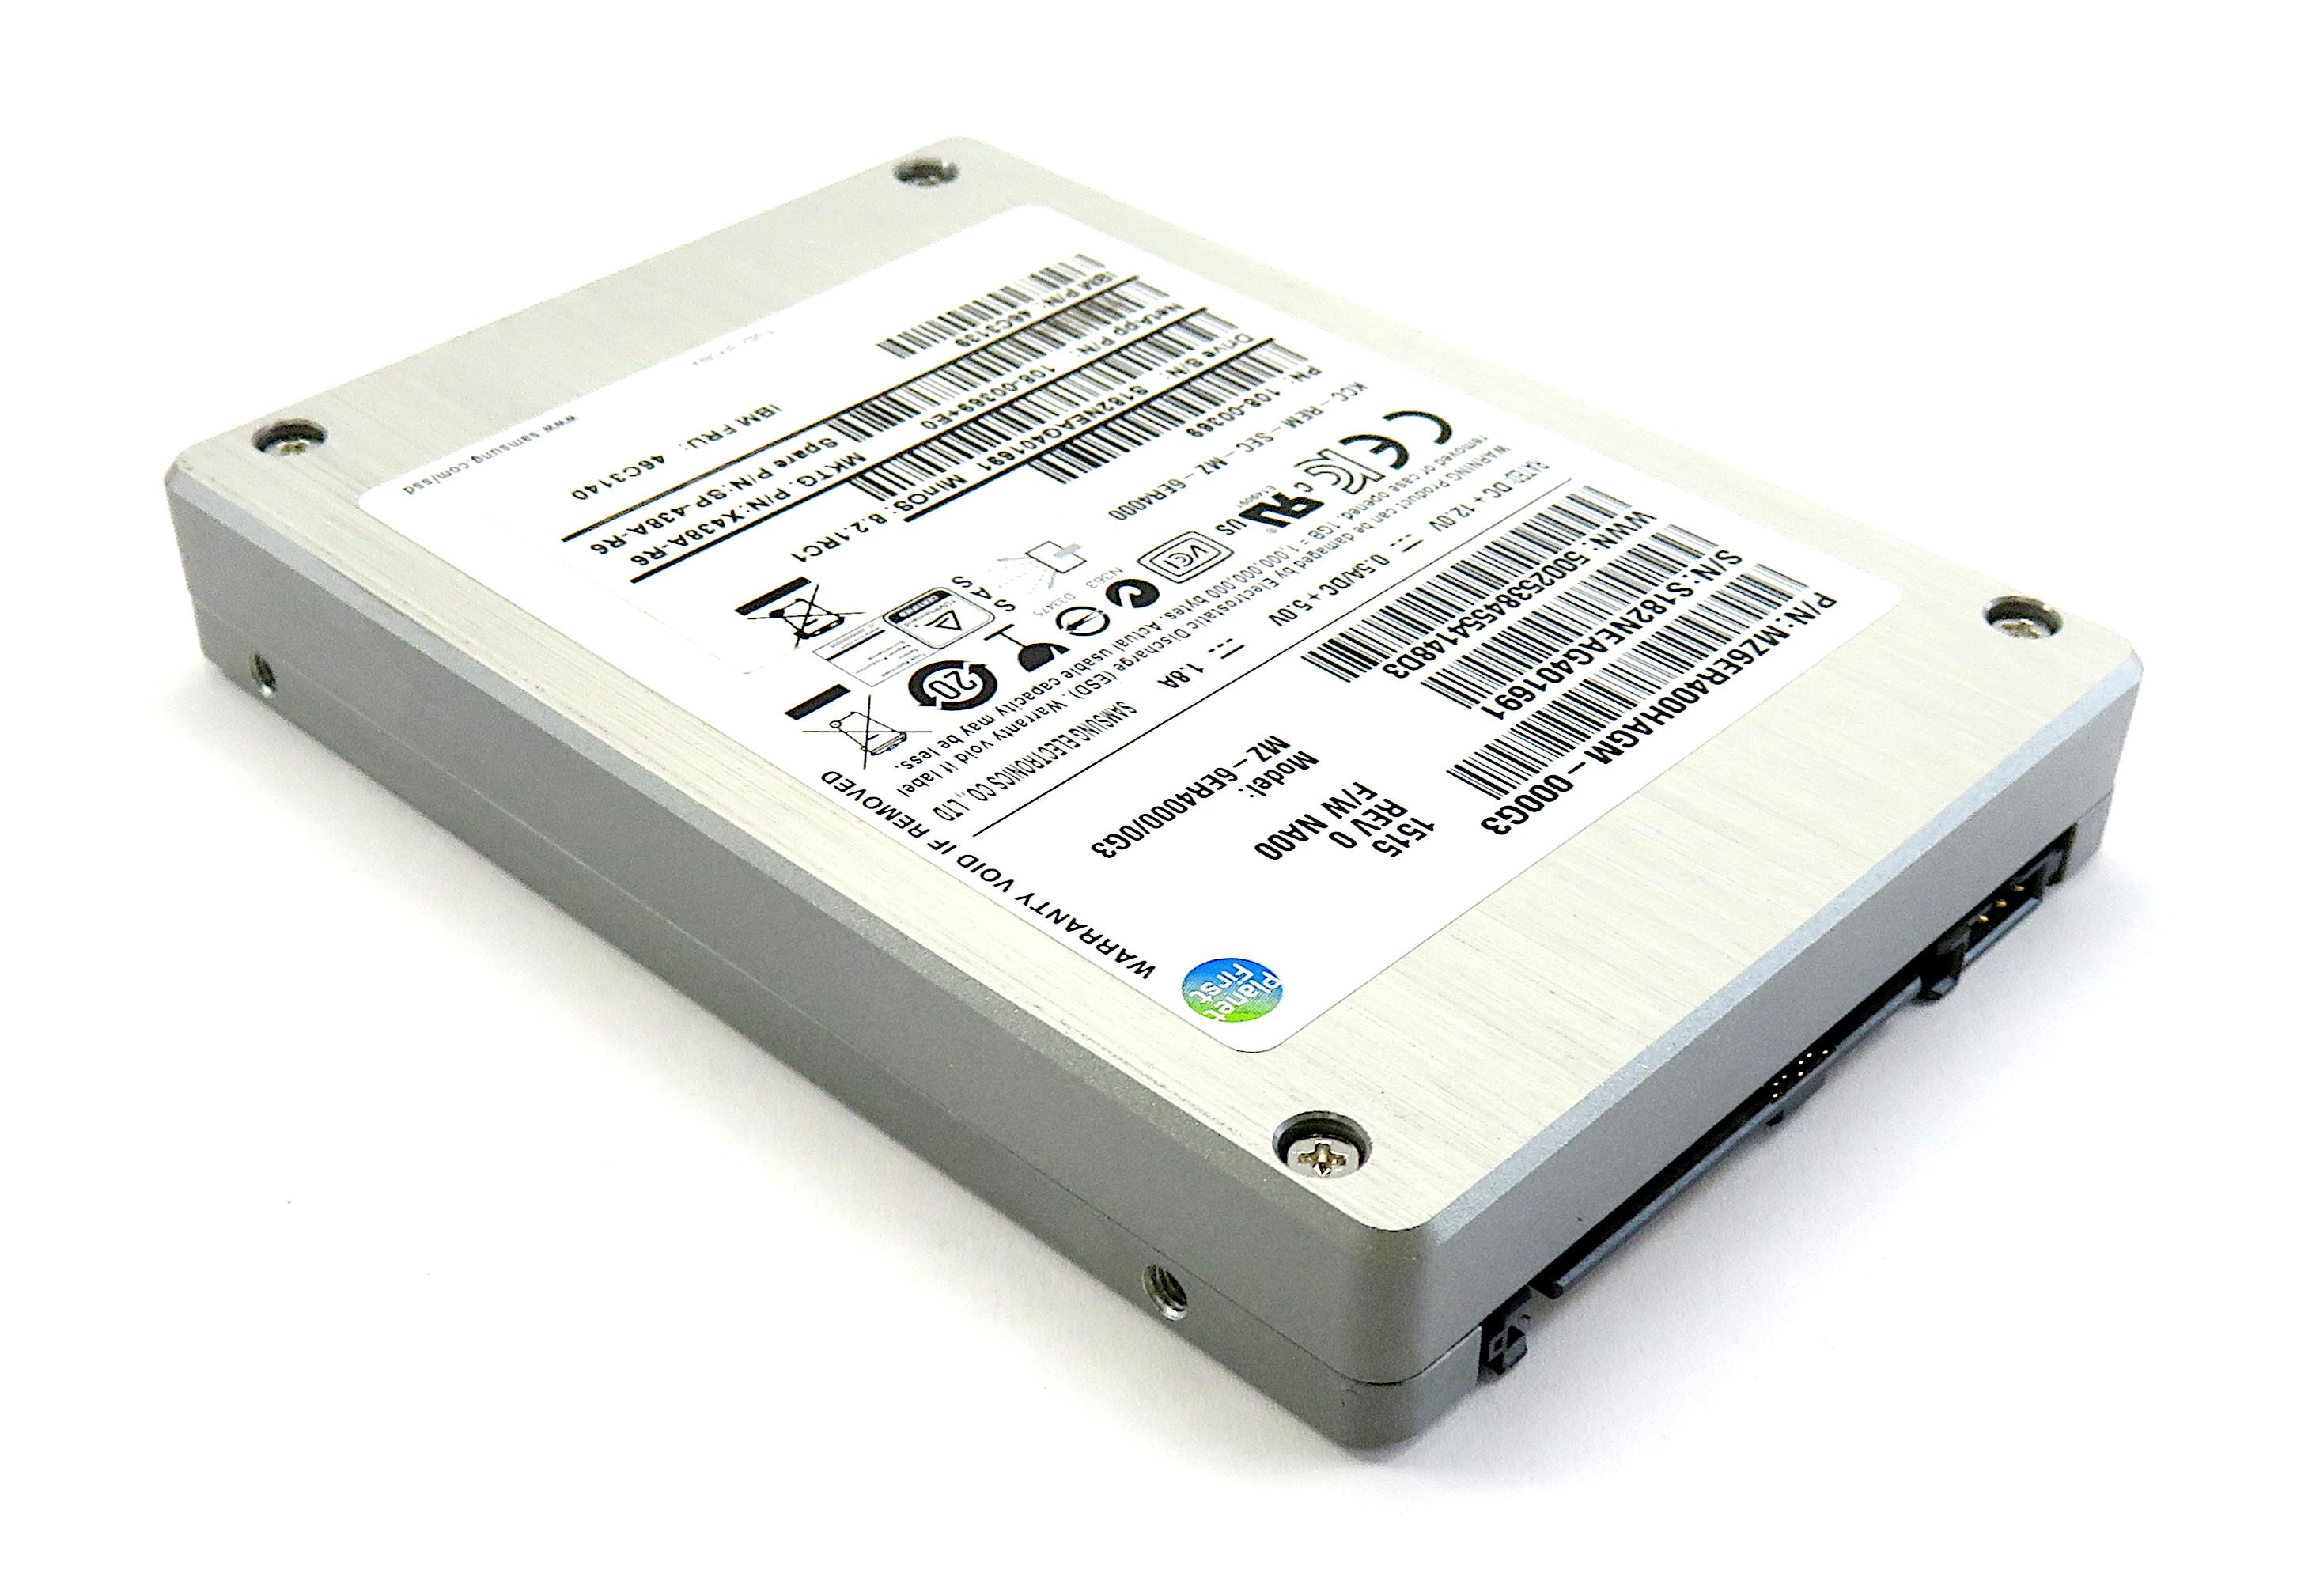 "Samsung 400Gb SSD 2.5"" SAS 6Gbps - MZ6ER400HAGM-000G3 - MZ-6ER4000/0G3"